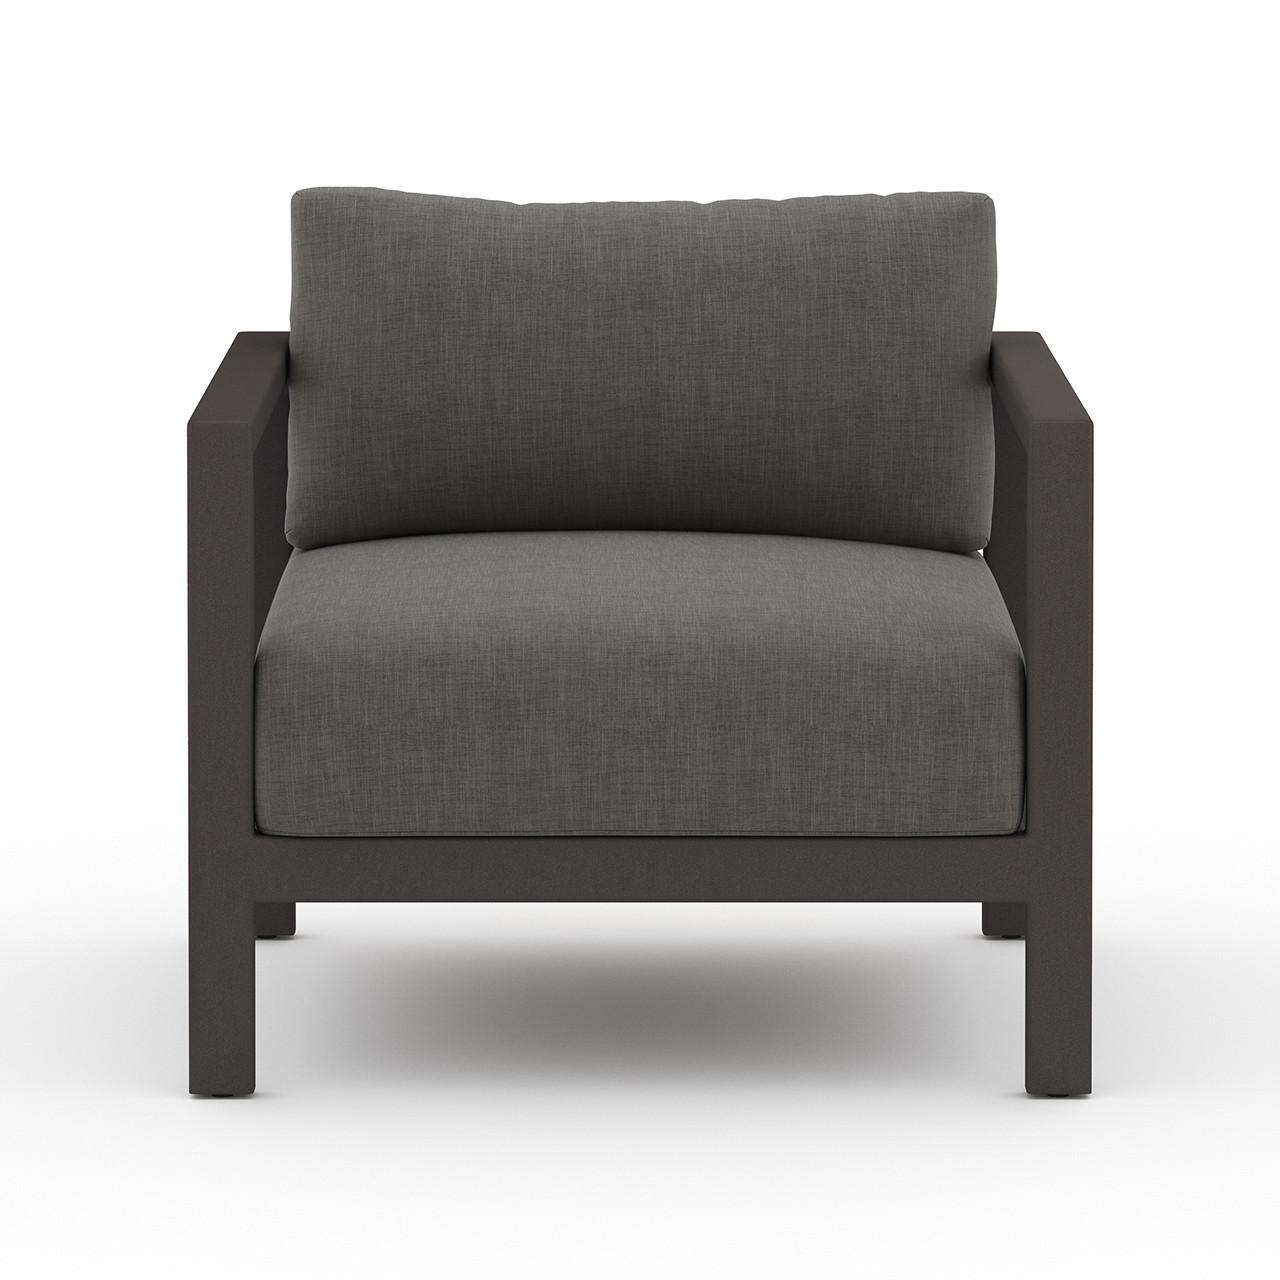 Oceanside Outdoor Lounge Chair - Black Bronze